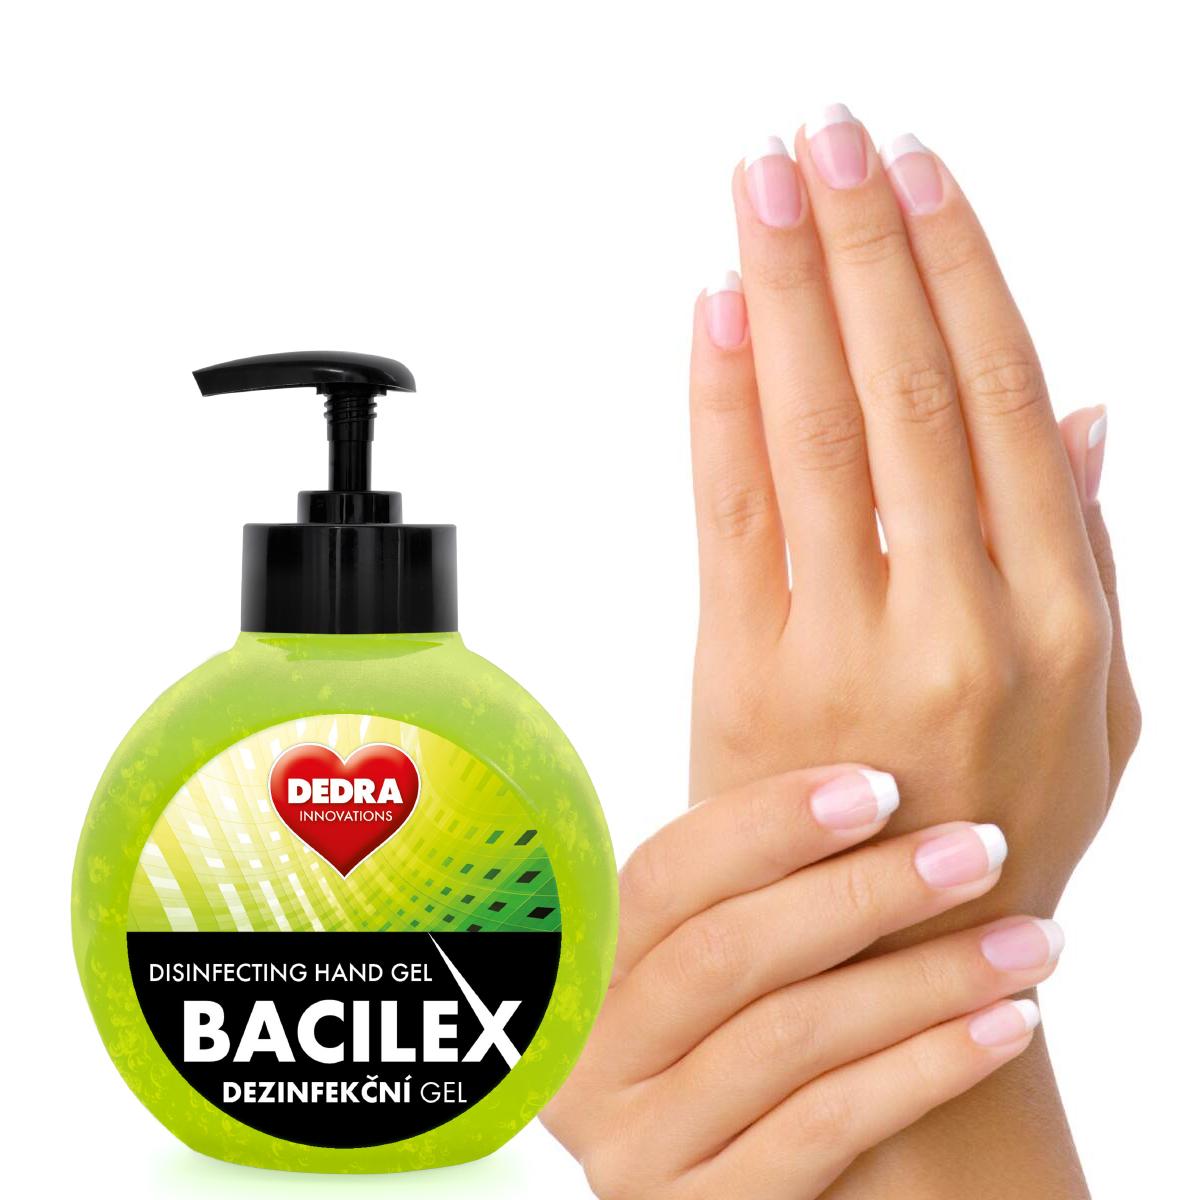 5 ks PROFI SADA certifikovaný dezinfekční gel na ruce, 70 % alkoholu, BACILEX DISINFECTING HAND GEL,